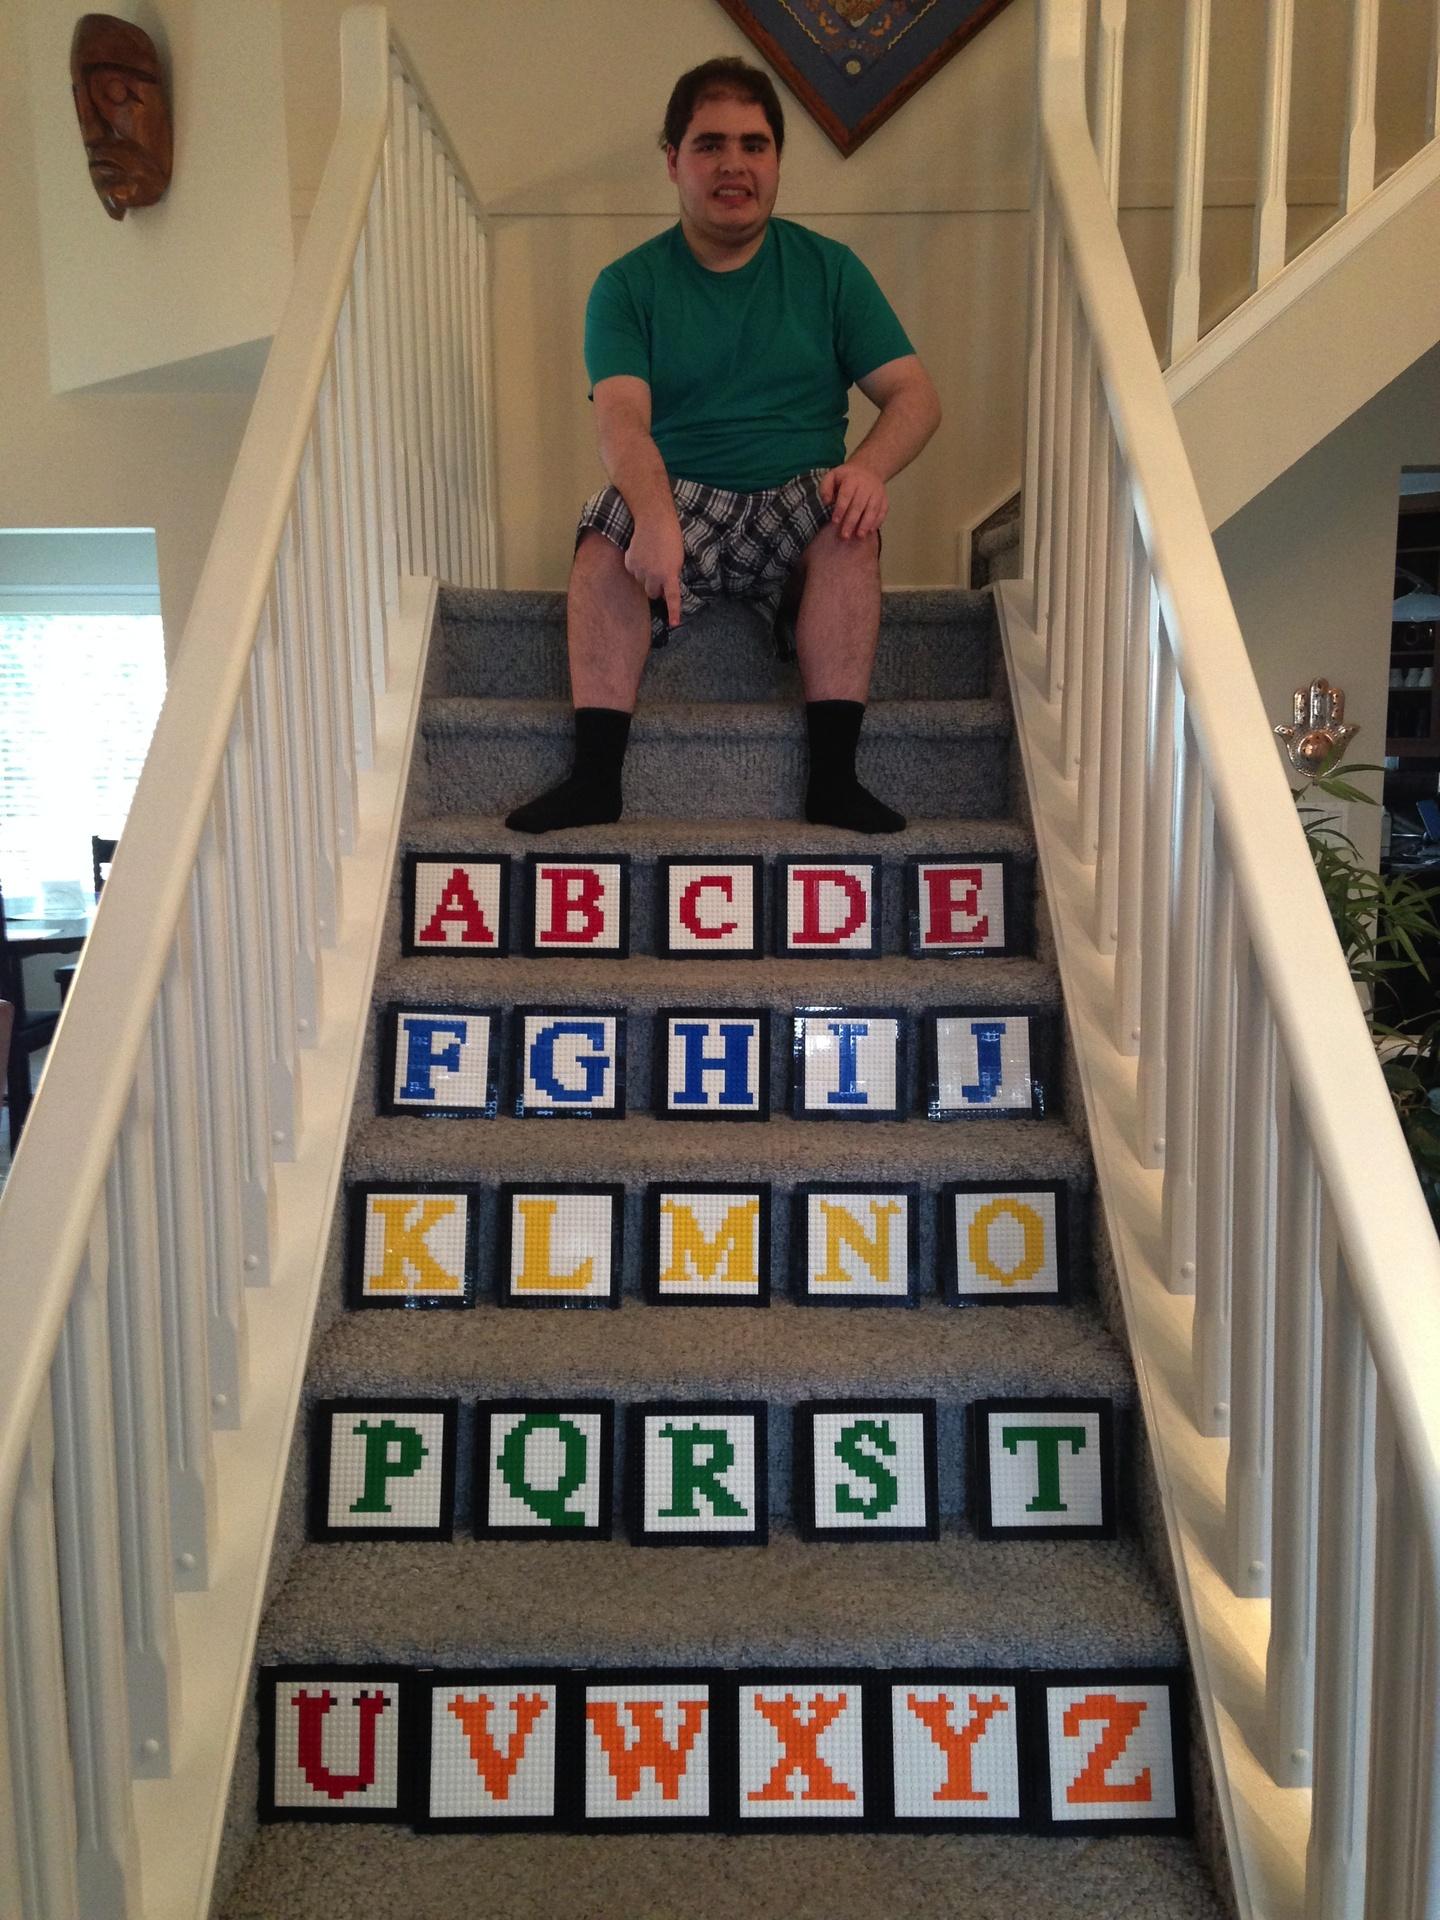 Aaron & Lego Letters.jpg